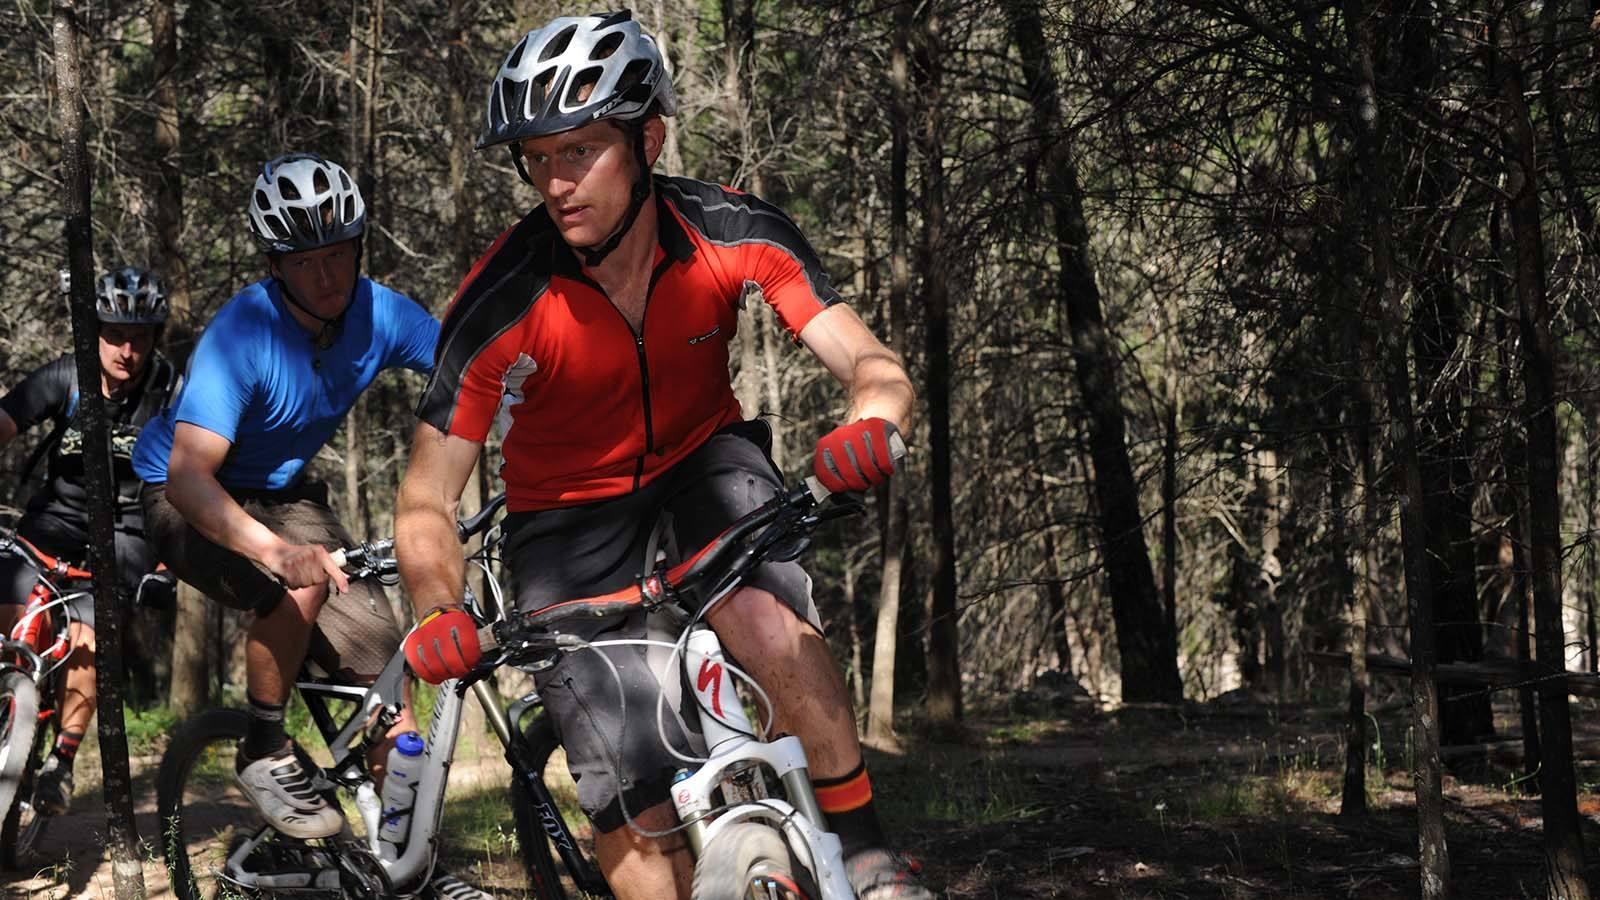 Beechworth Mountain Bike Park, High Country, Victoria, Australia